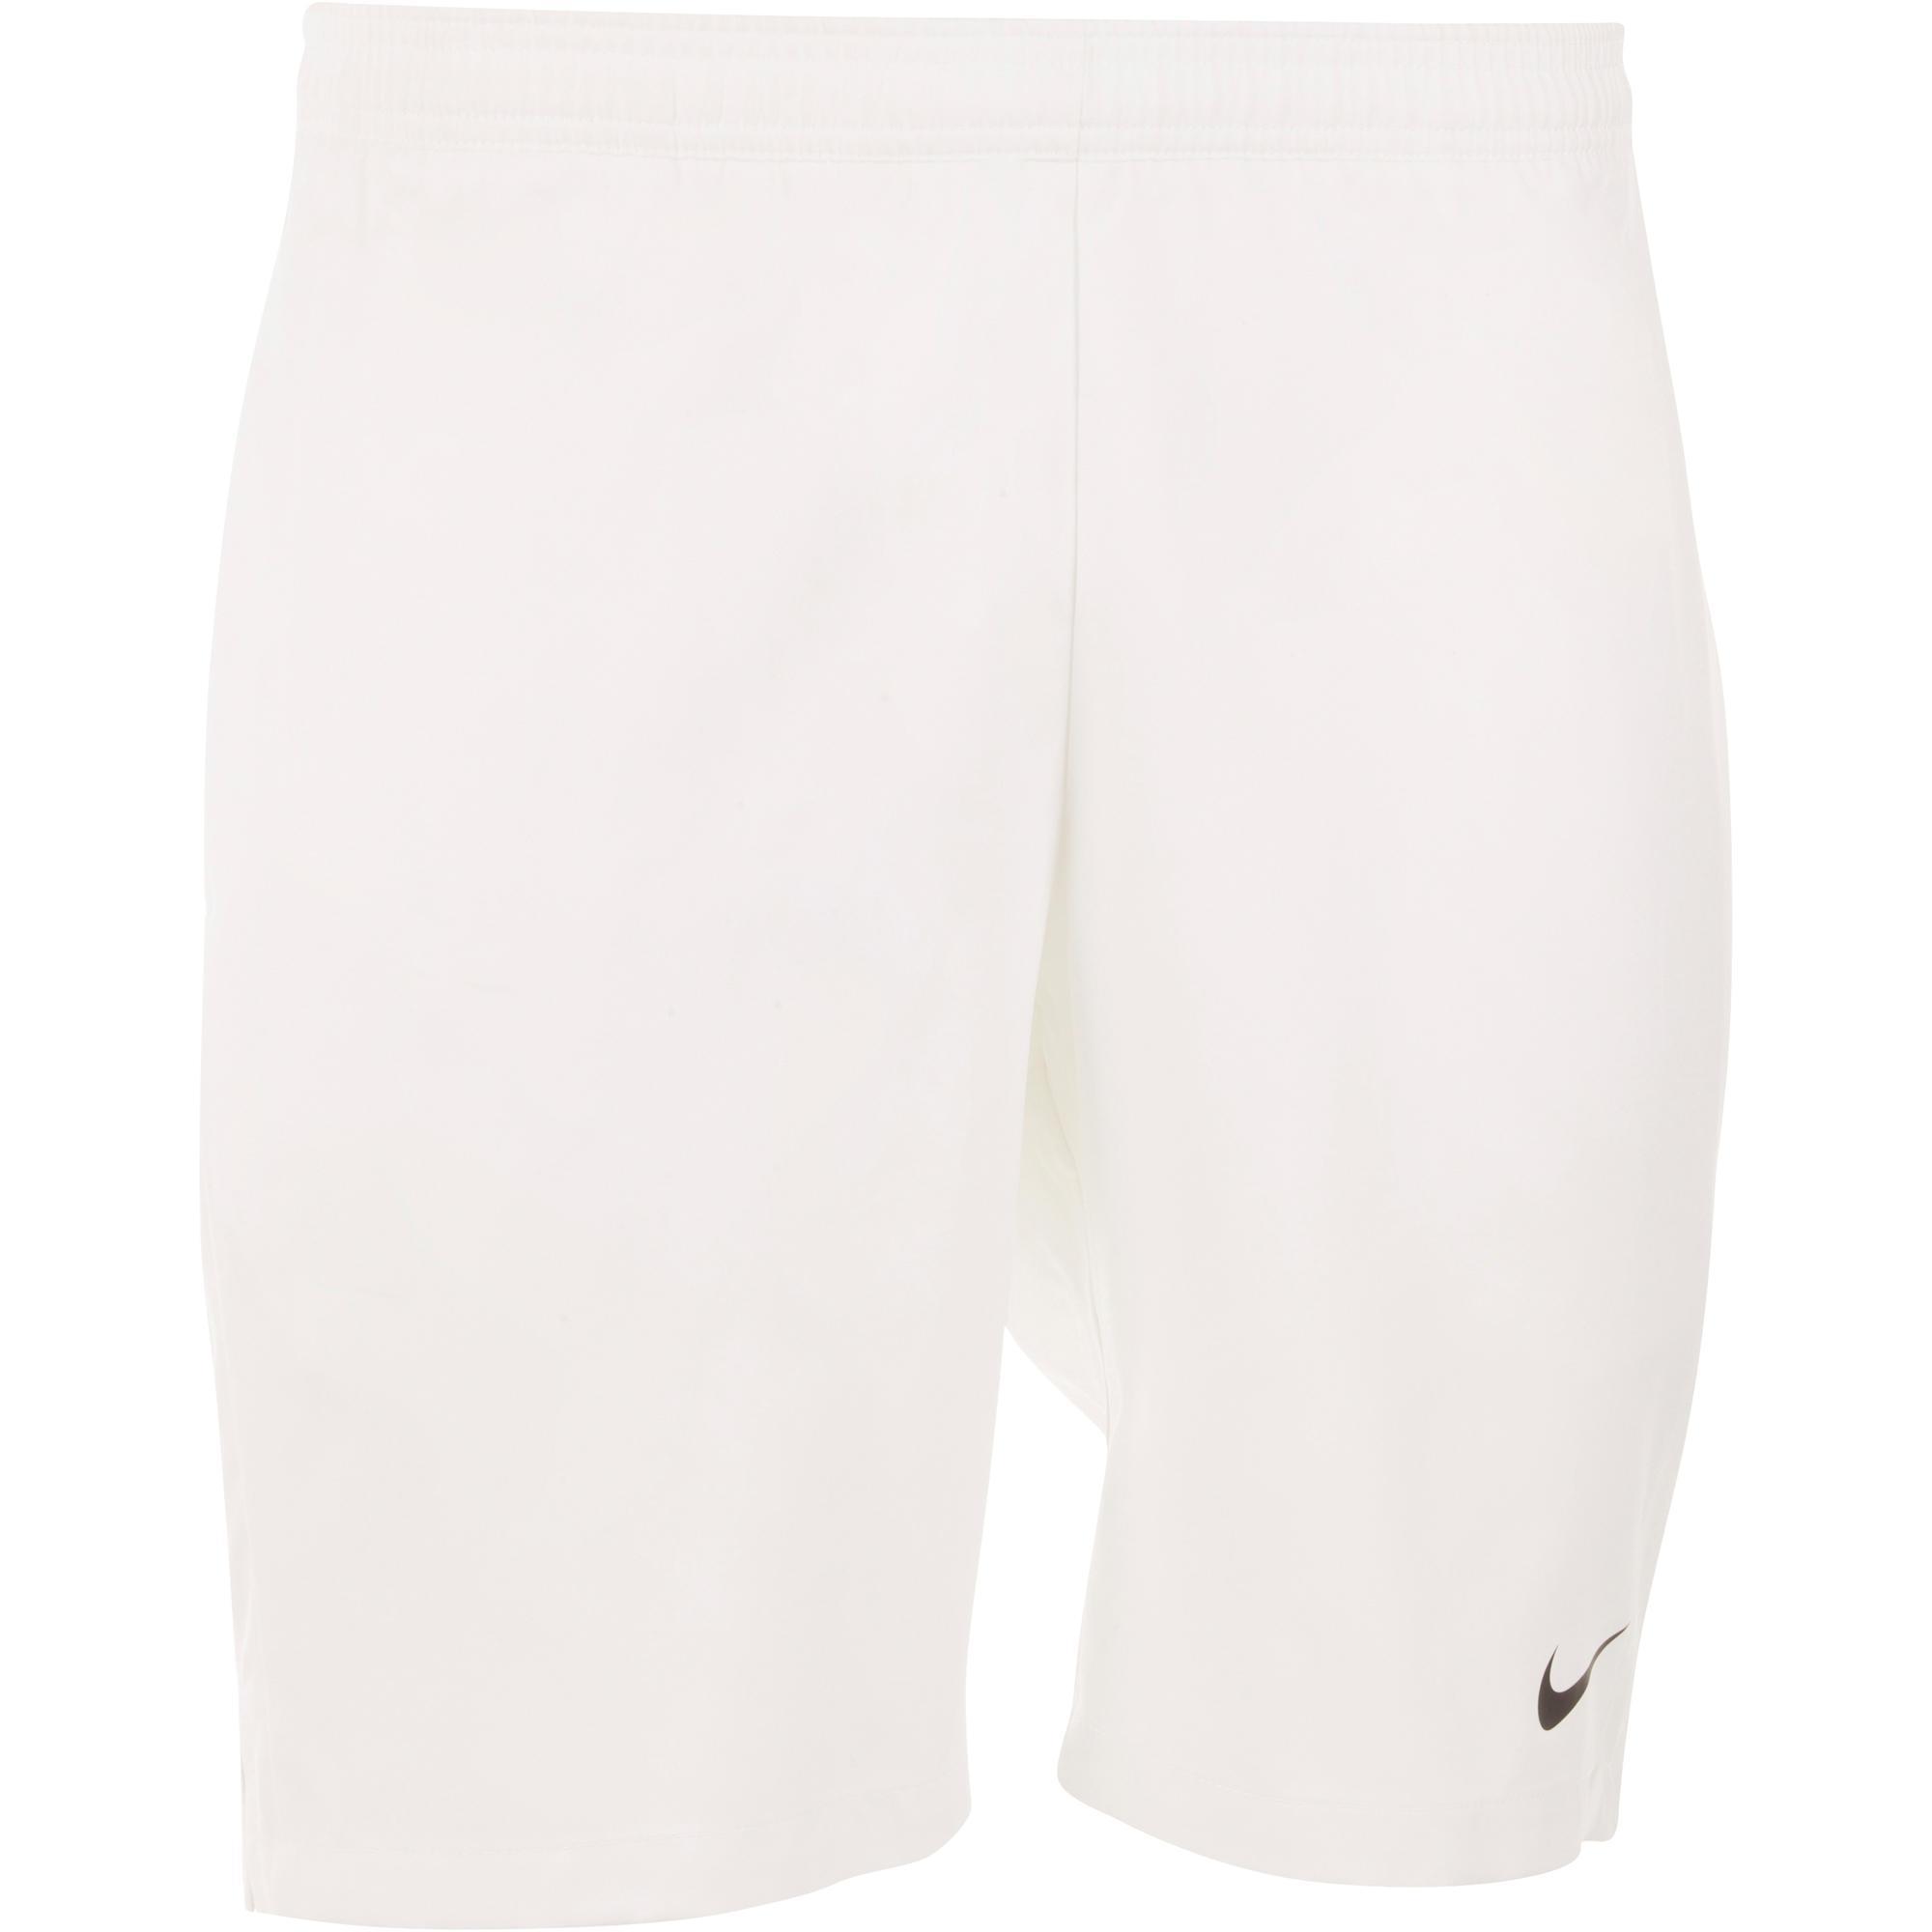 Nike Tennisshort Nike DRI-FIT wit